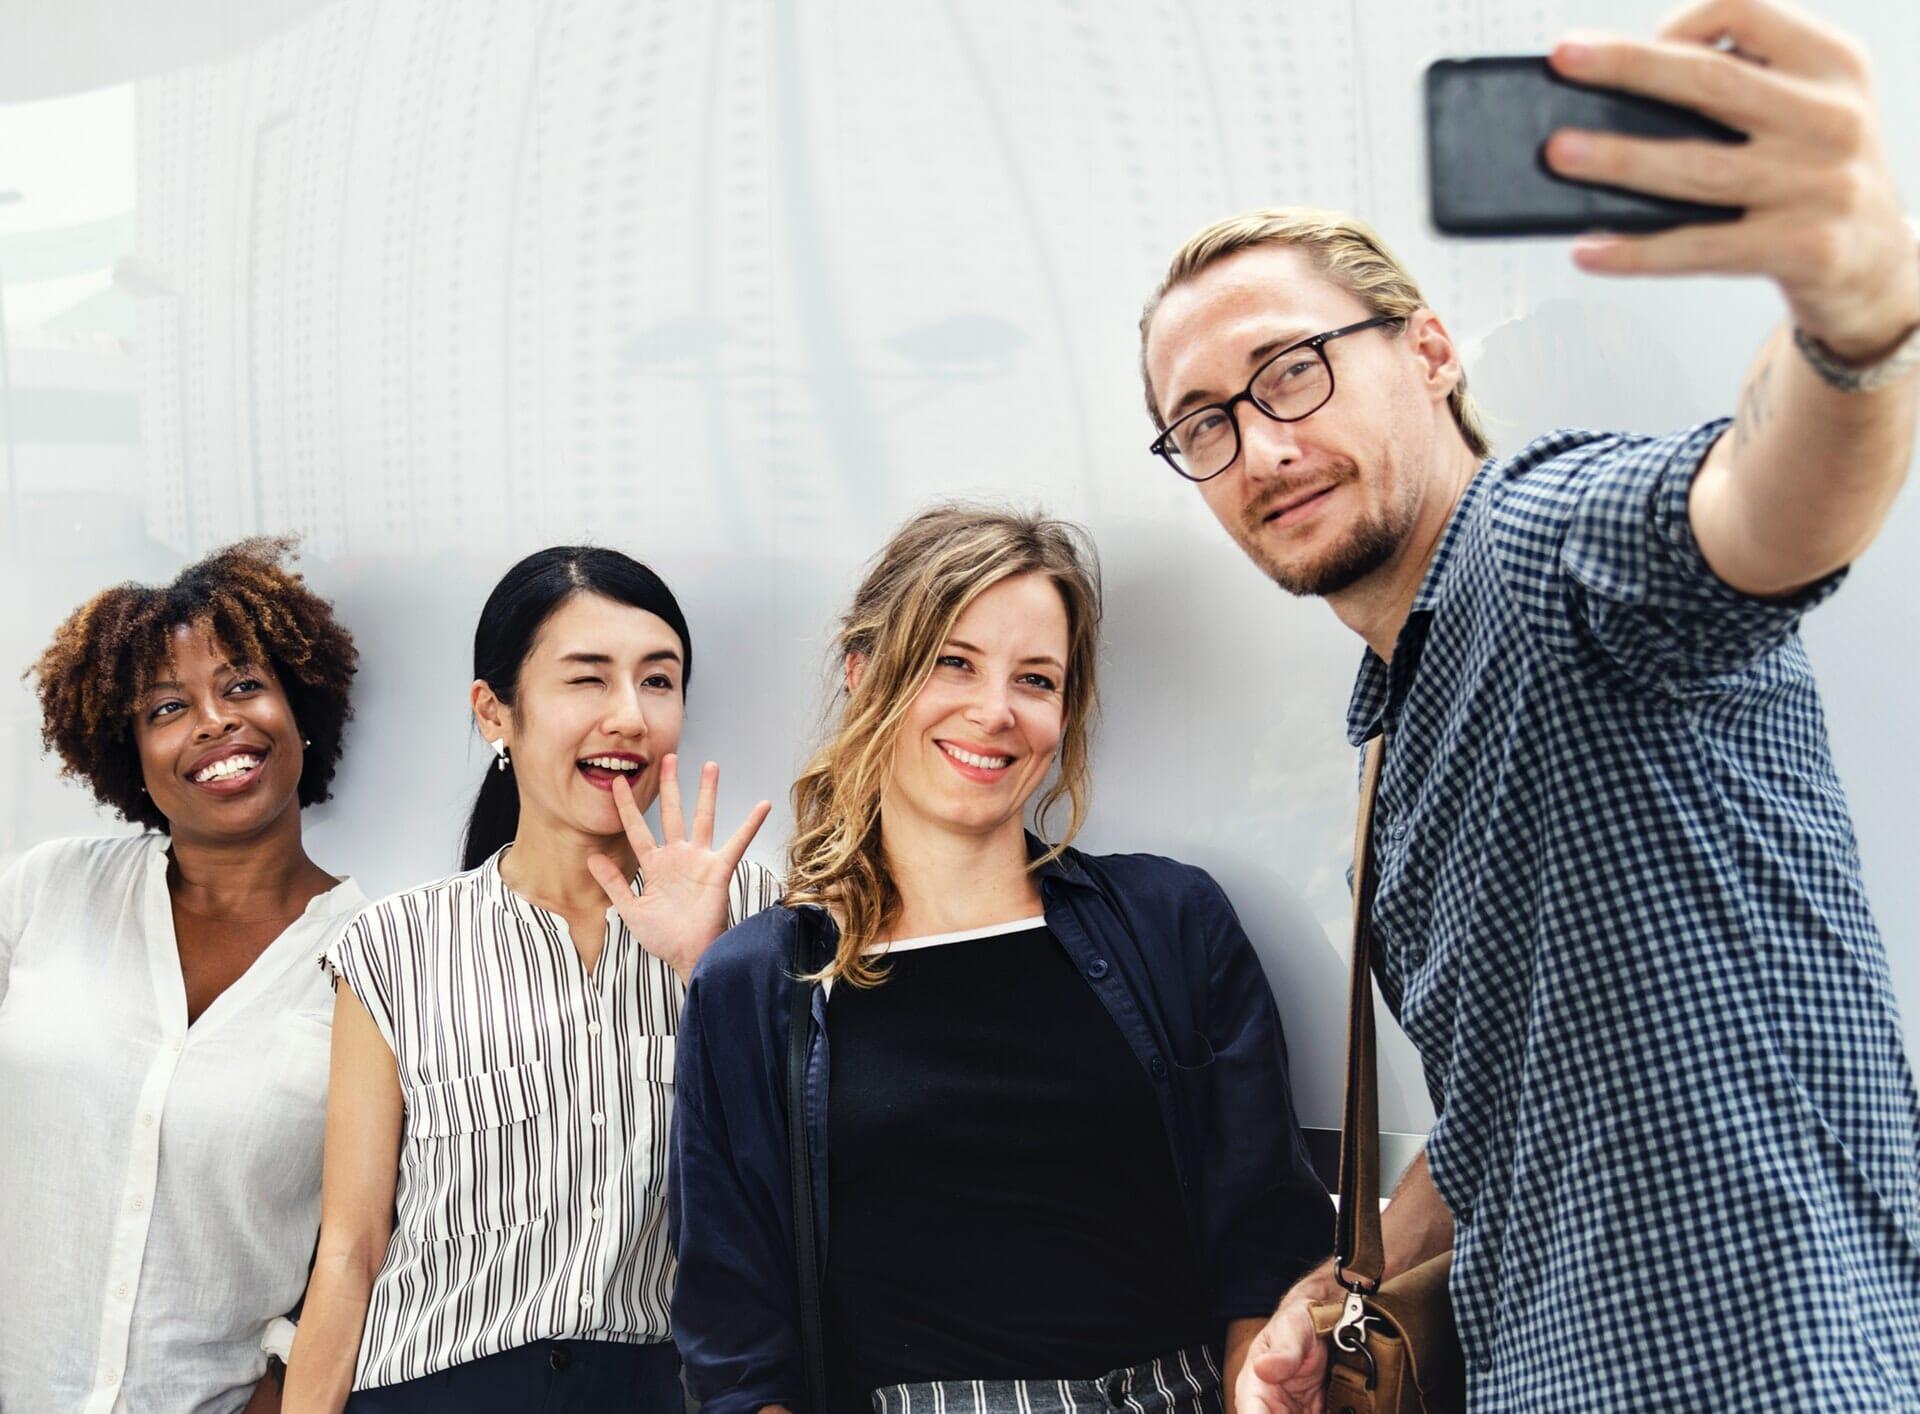 social media ideas for small business, social media post ideas for business 2019, creative social media post 2019, social media for small business owners, social media posts example, social media for small business tips, social media marketing, social media business